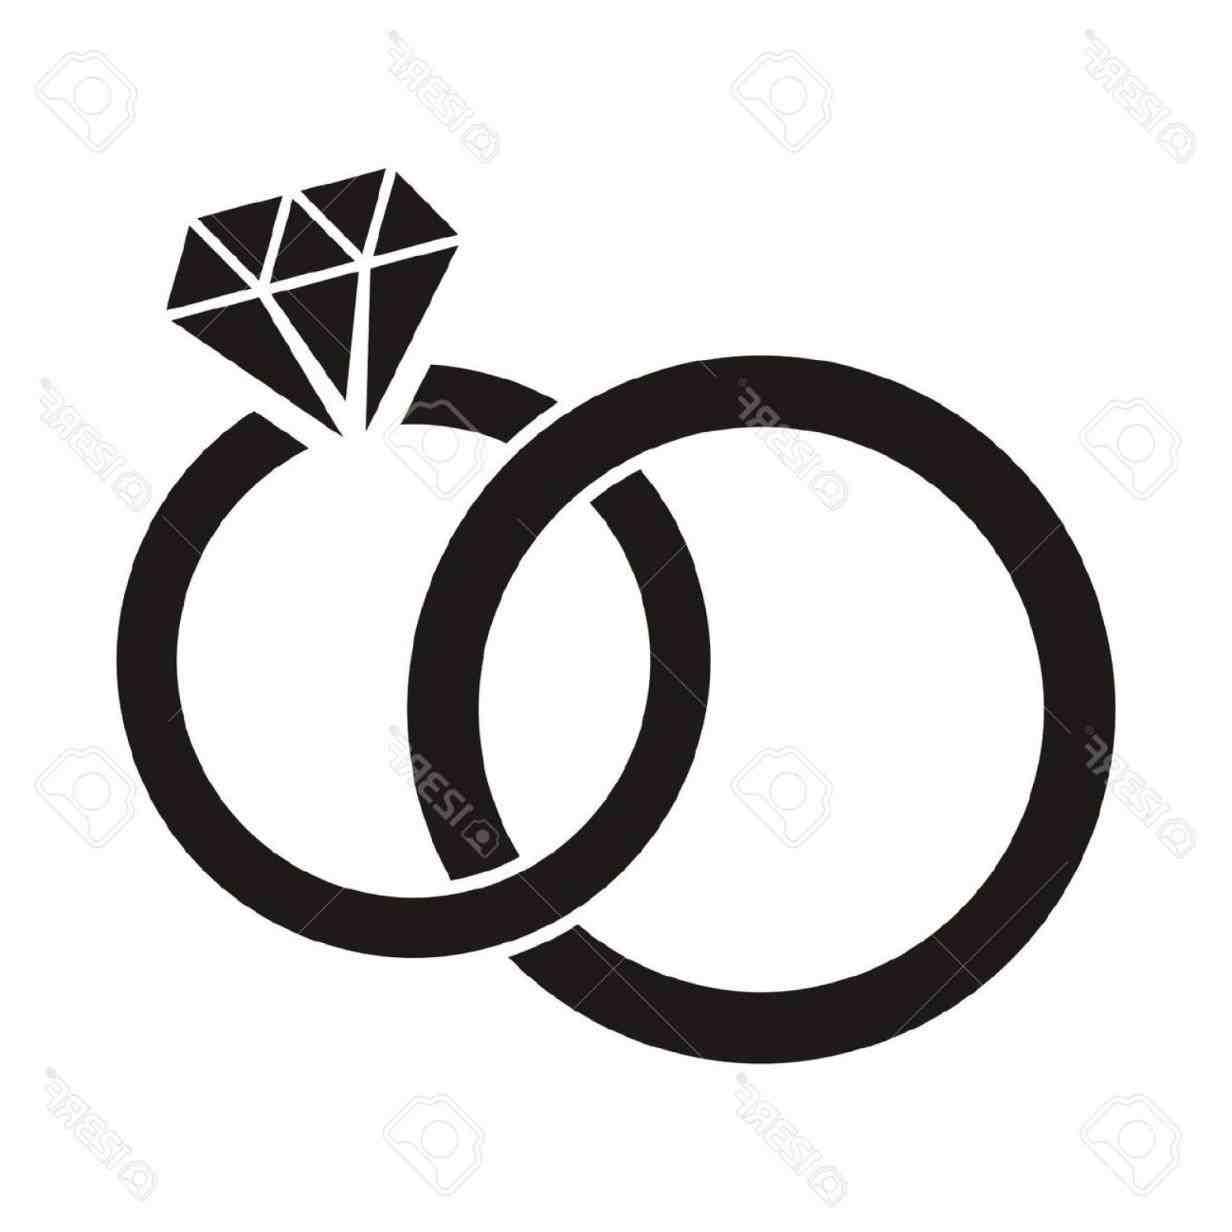 bridal silhouette clip art at getdrawings com free for personal rh getdrawings com